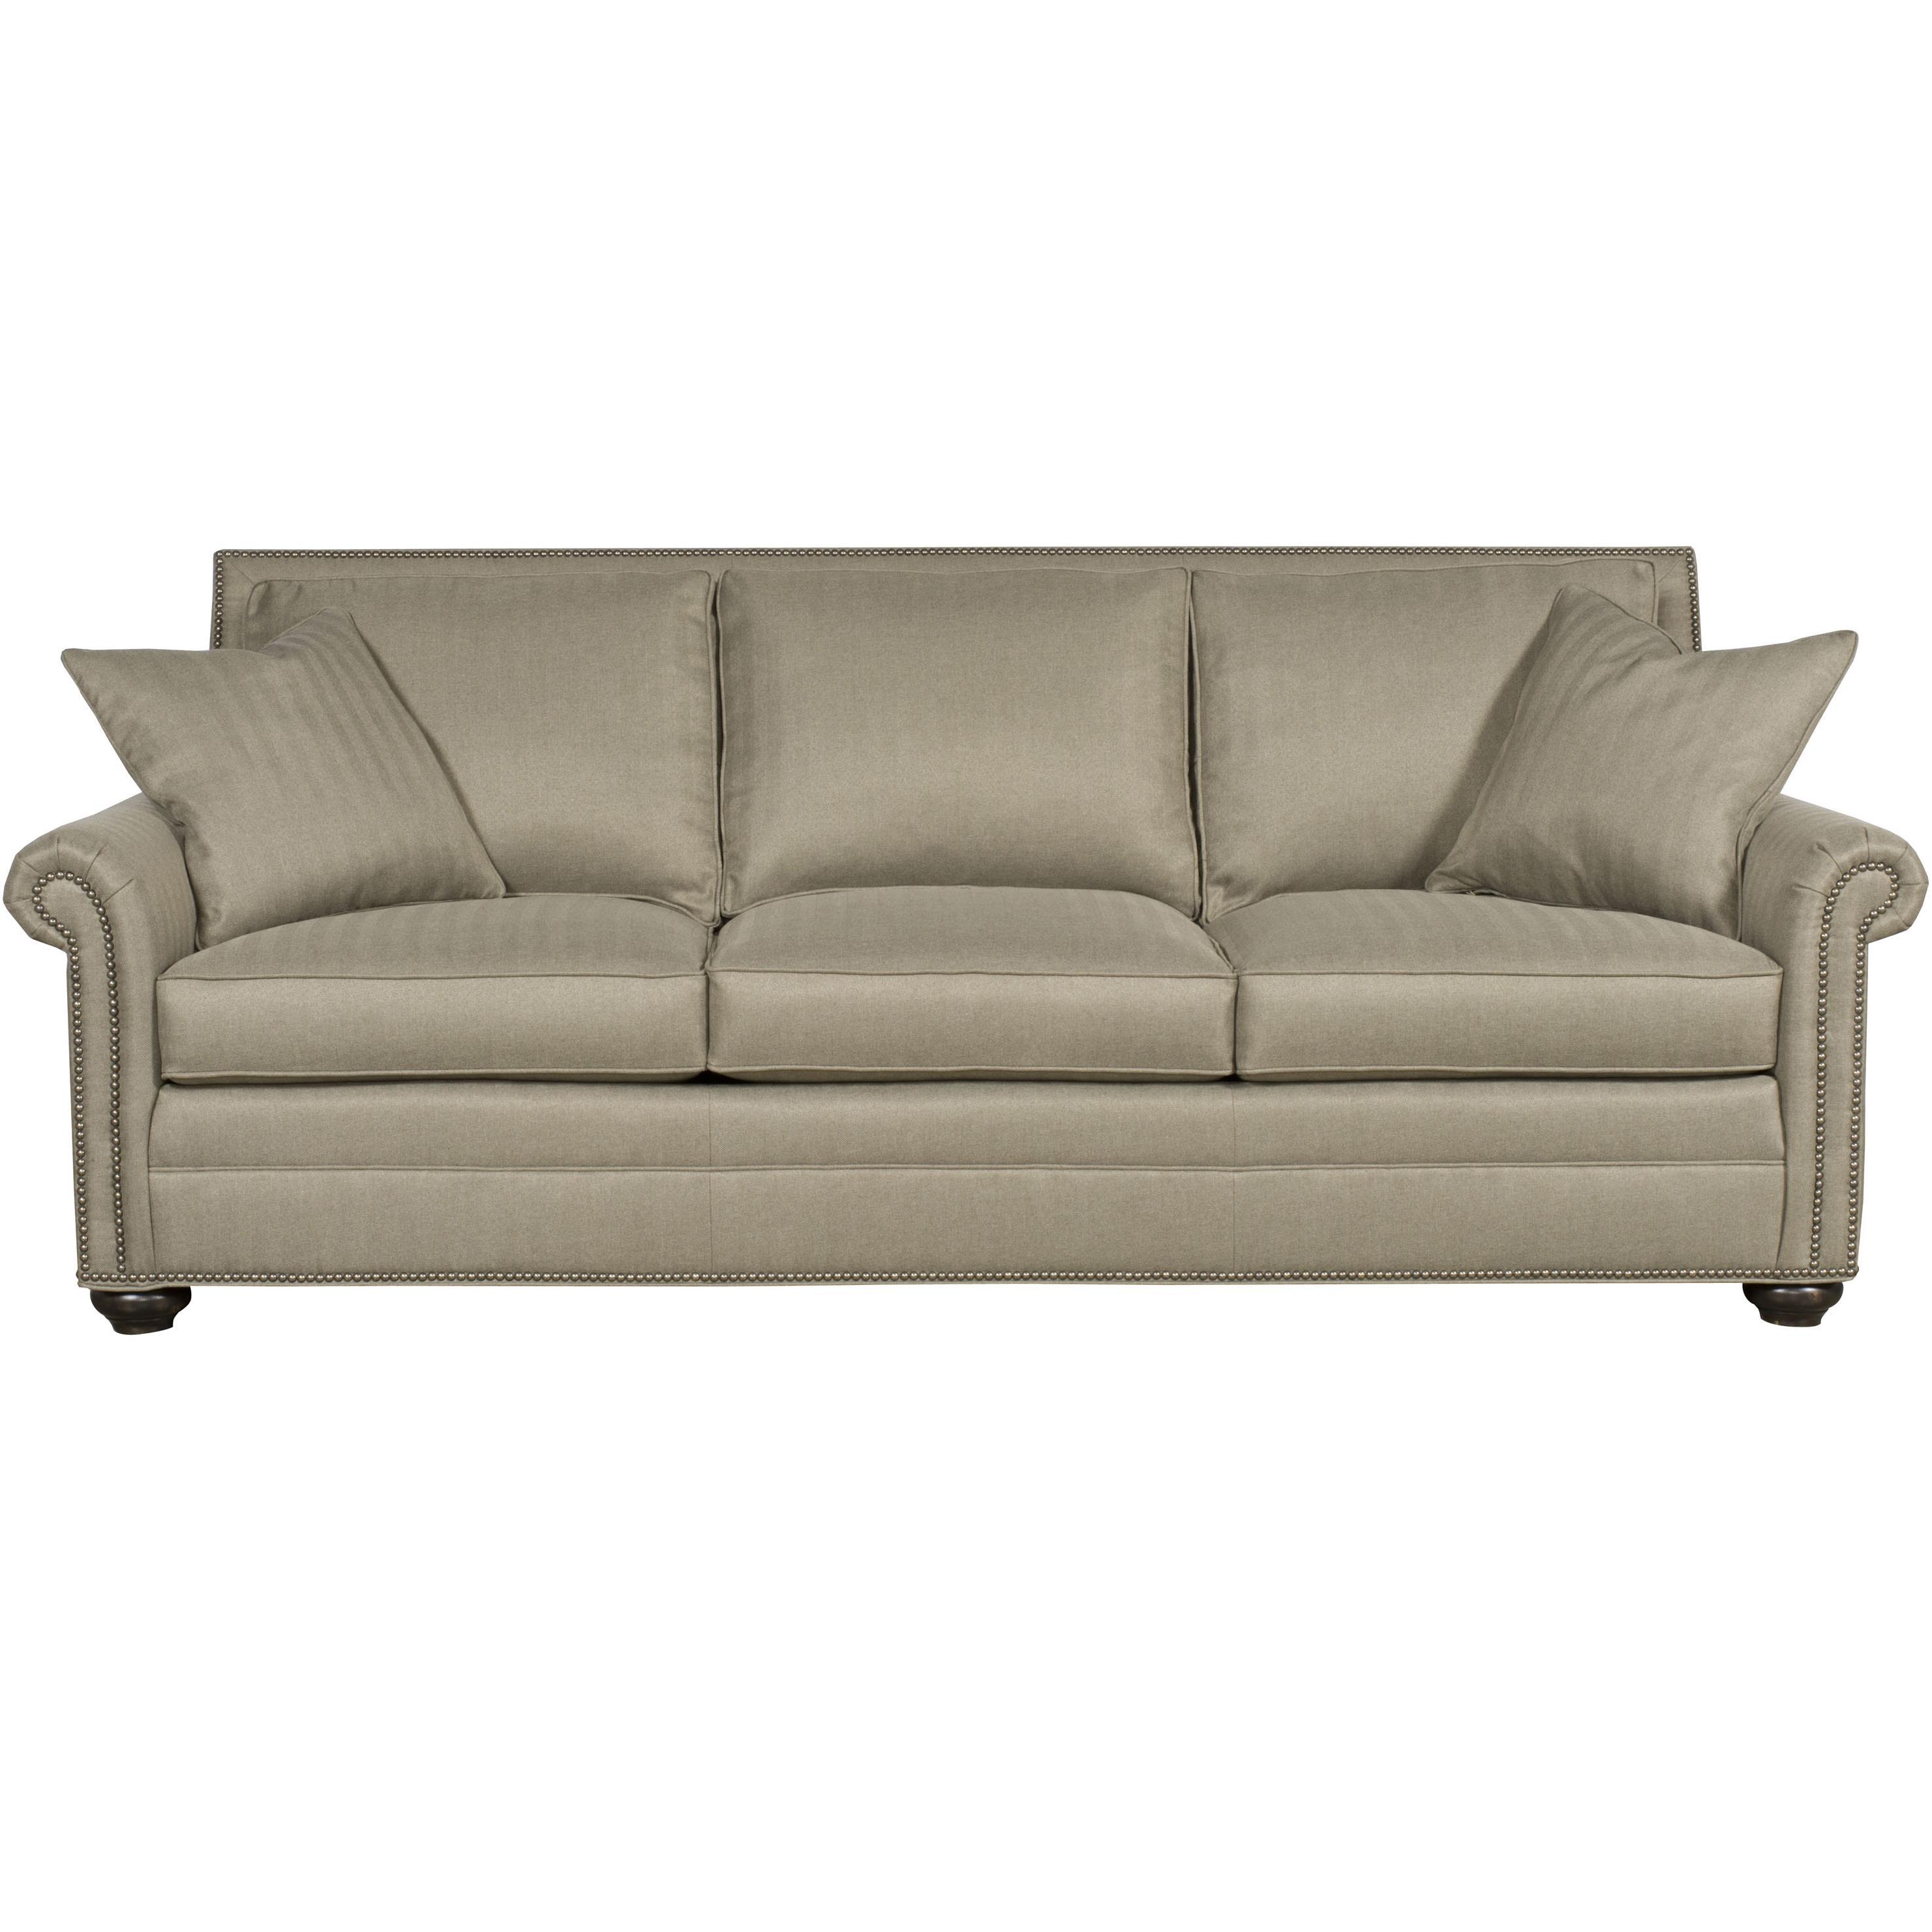 Vanguard Furniture Simpson Traditional Sofa Sleeper With